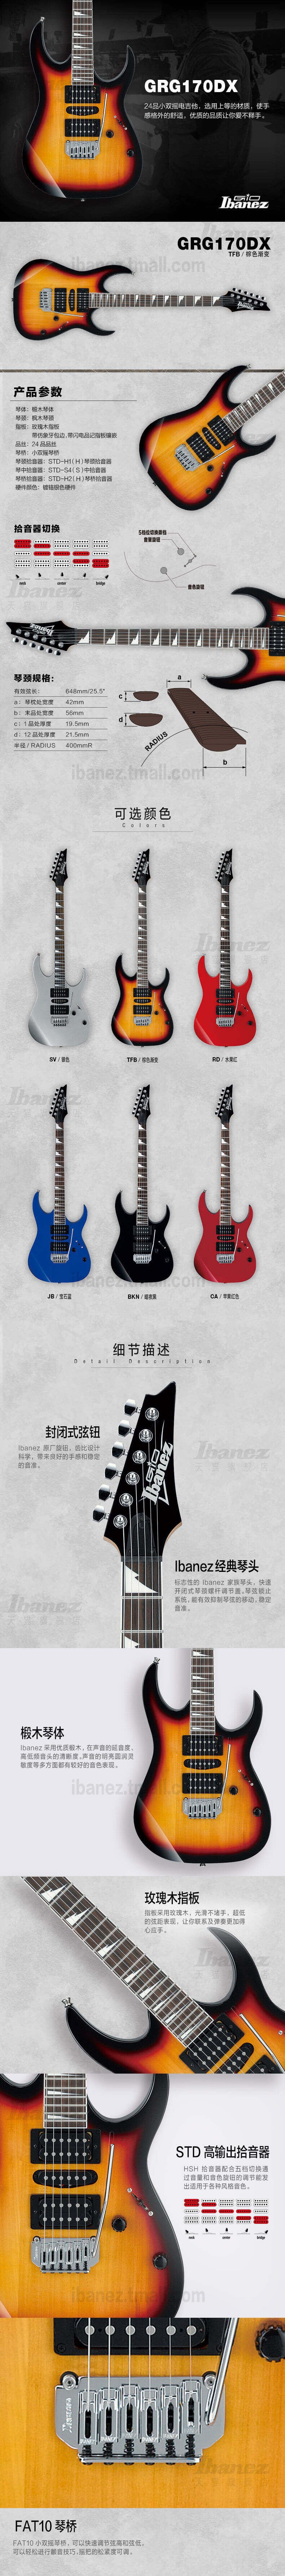 Ibanez官方旗舰店 依班娜GRG170DX电吉他 多色可选初学者适用新款 05